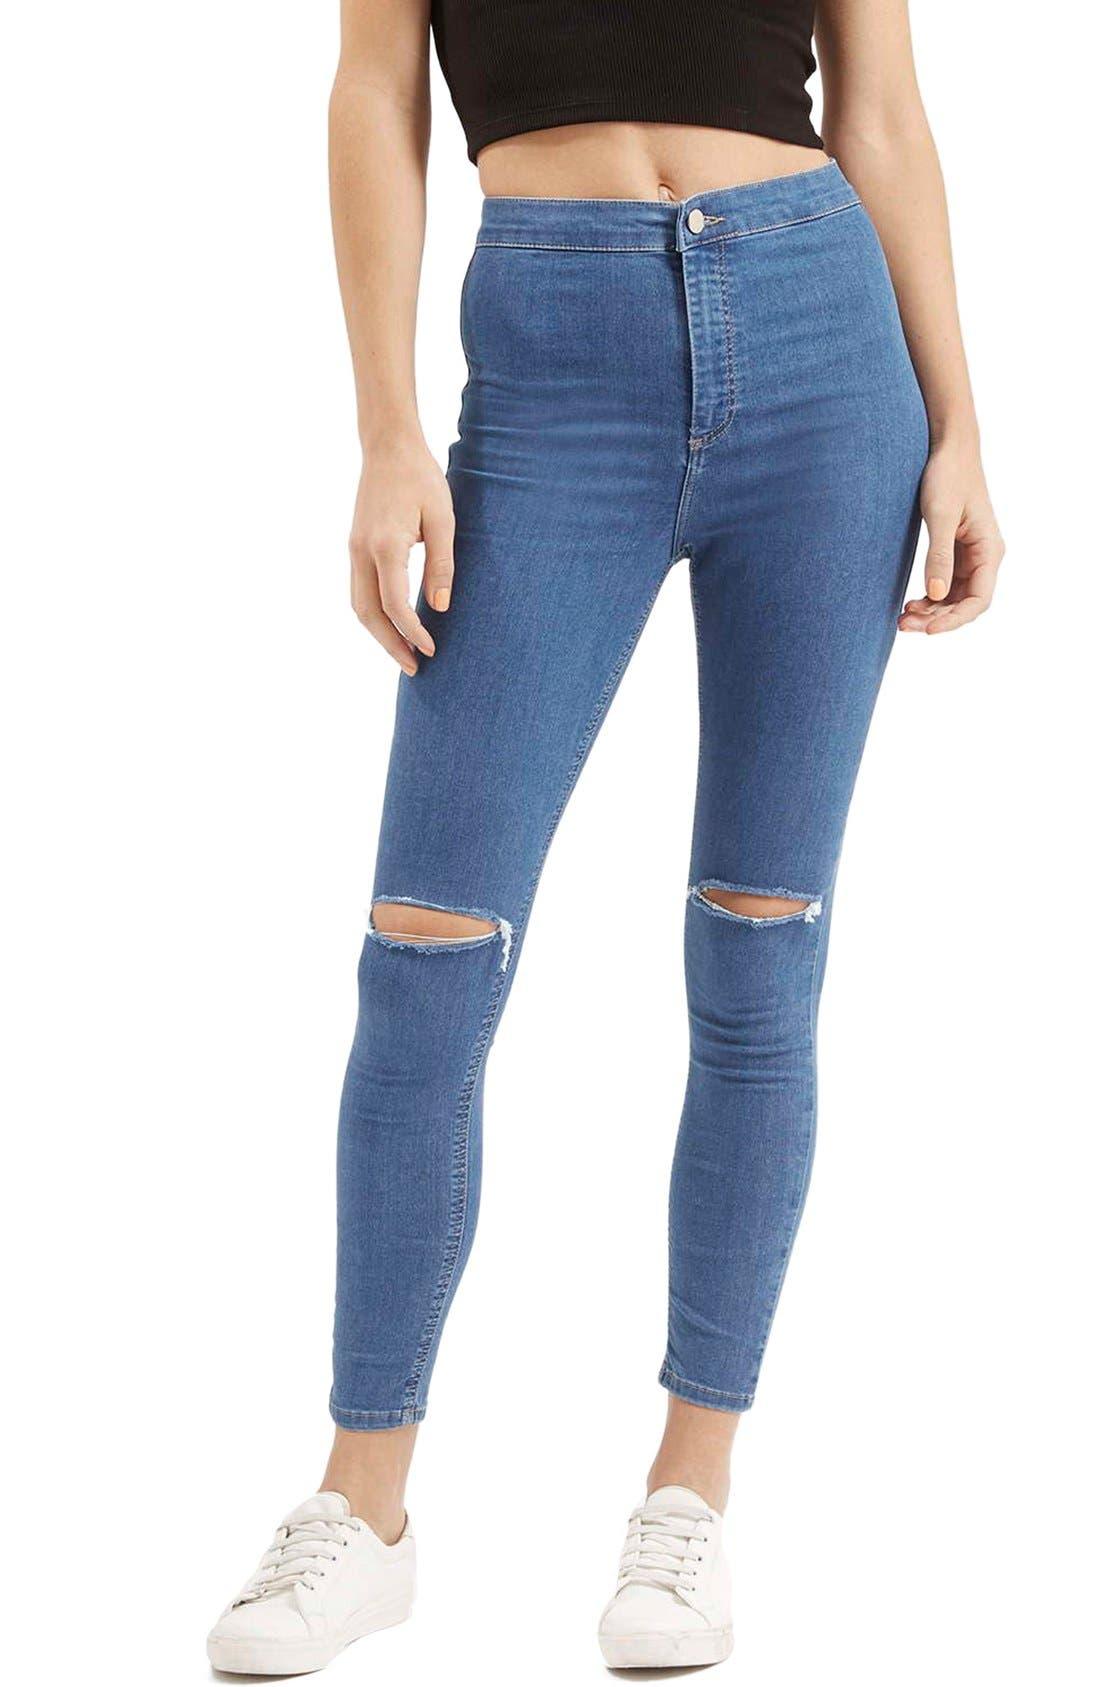 Alternate Image 1 Selected - Topshop 'Joni' RippedHigh Rise Skinny Jeans (Petite)